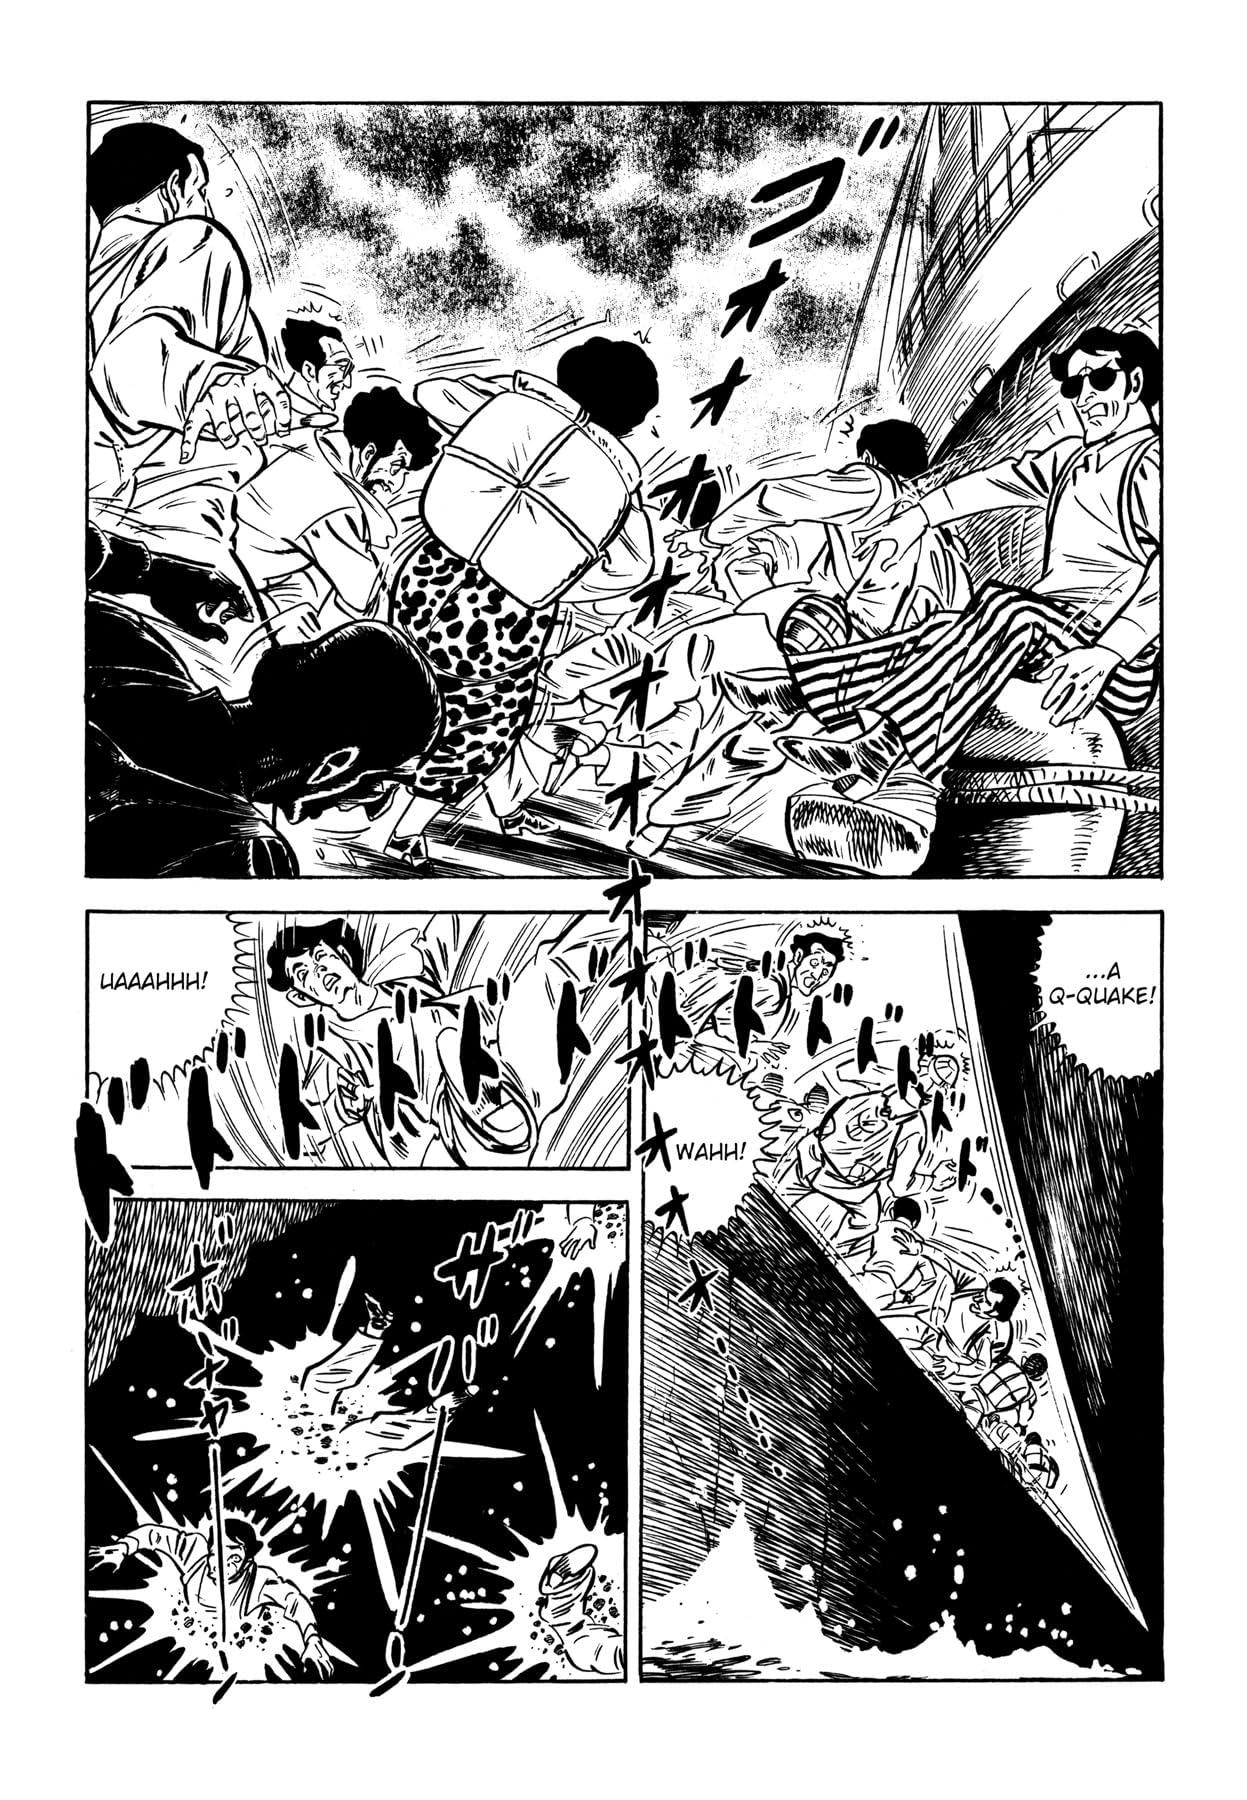 Japan sinks #22